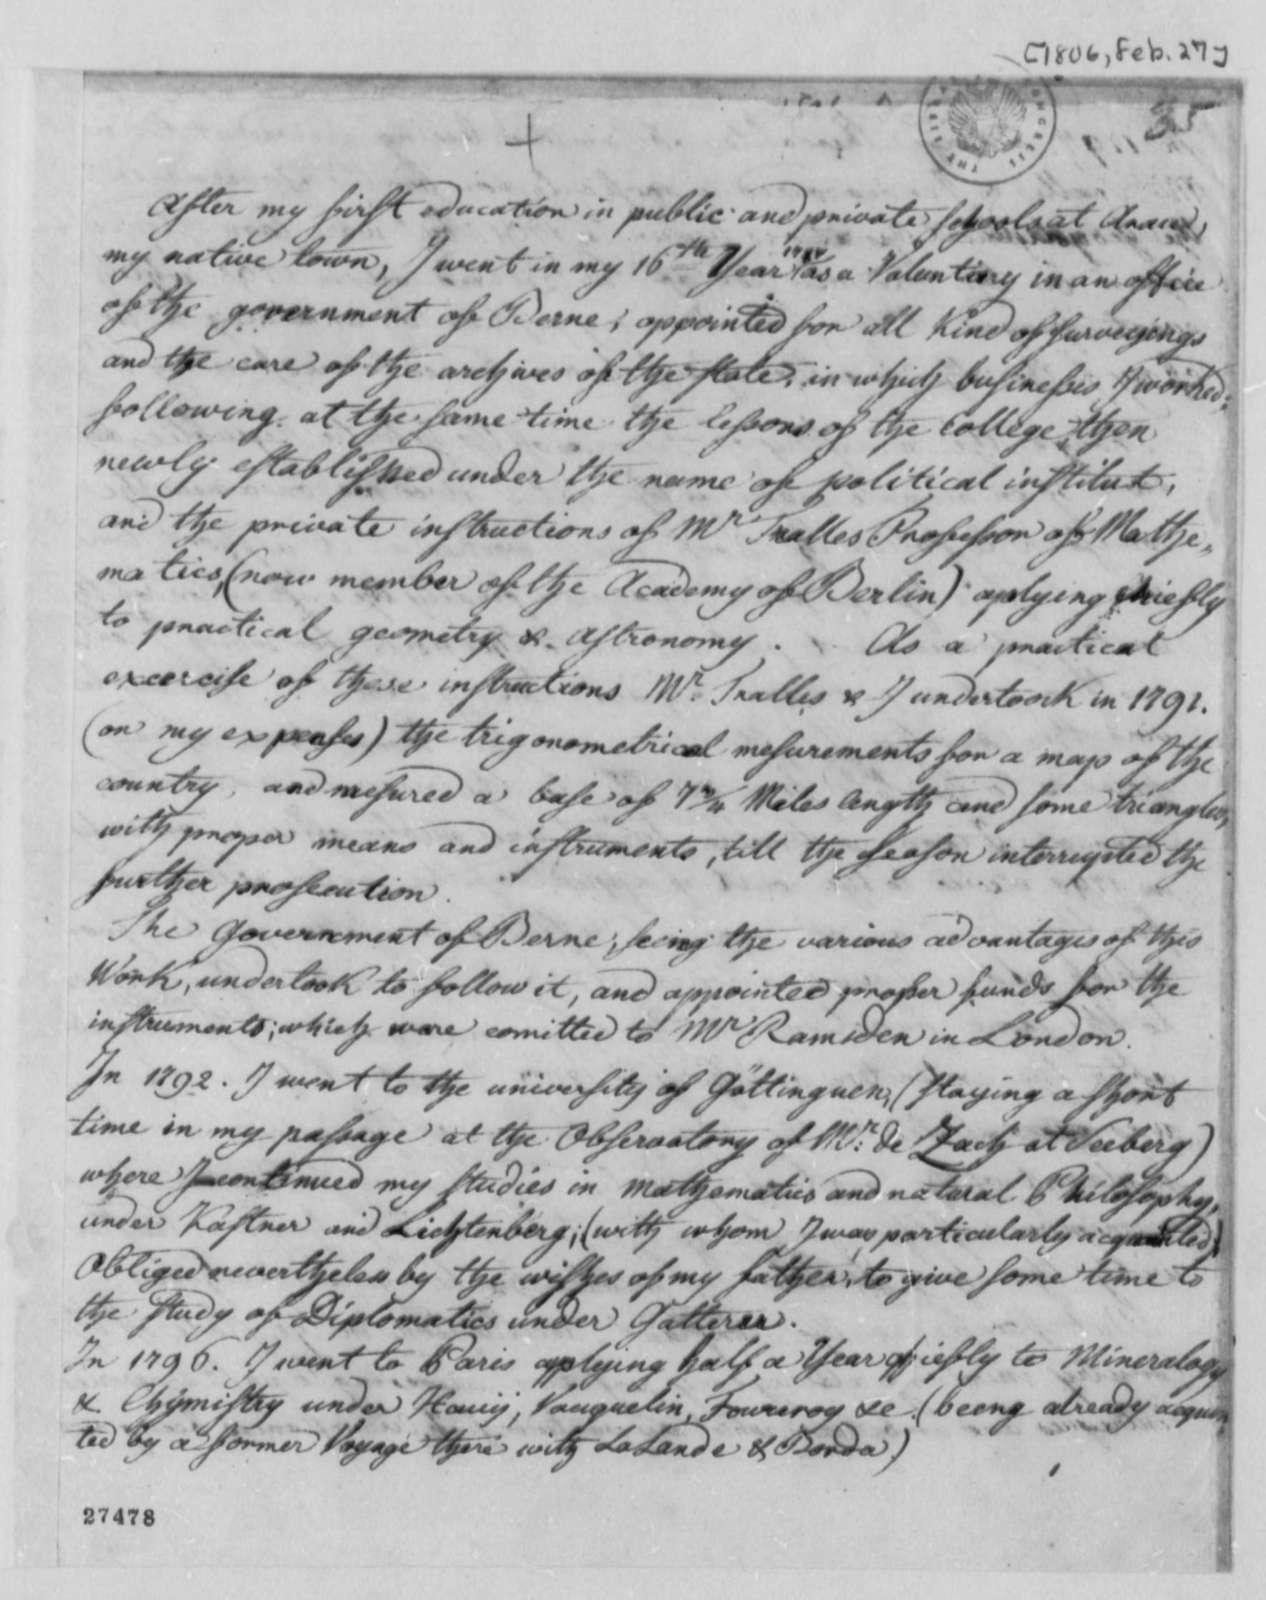 Ferdinand R. Hassler to Robert Patterson, February 27, 1806